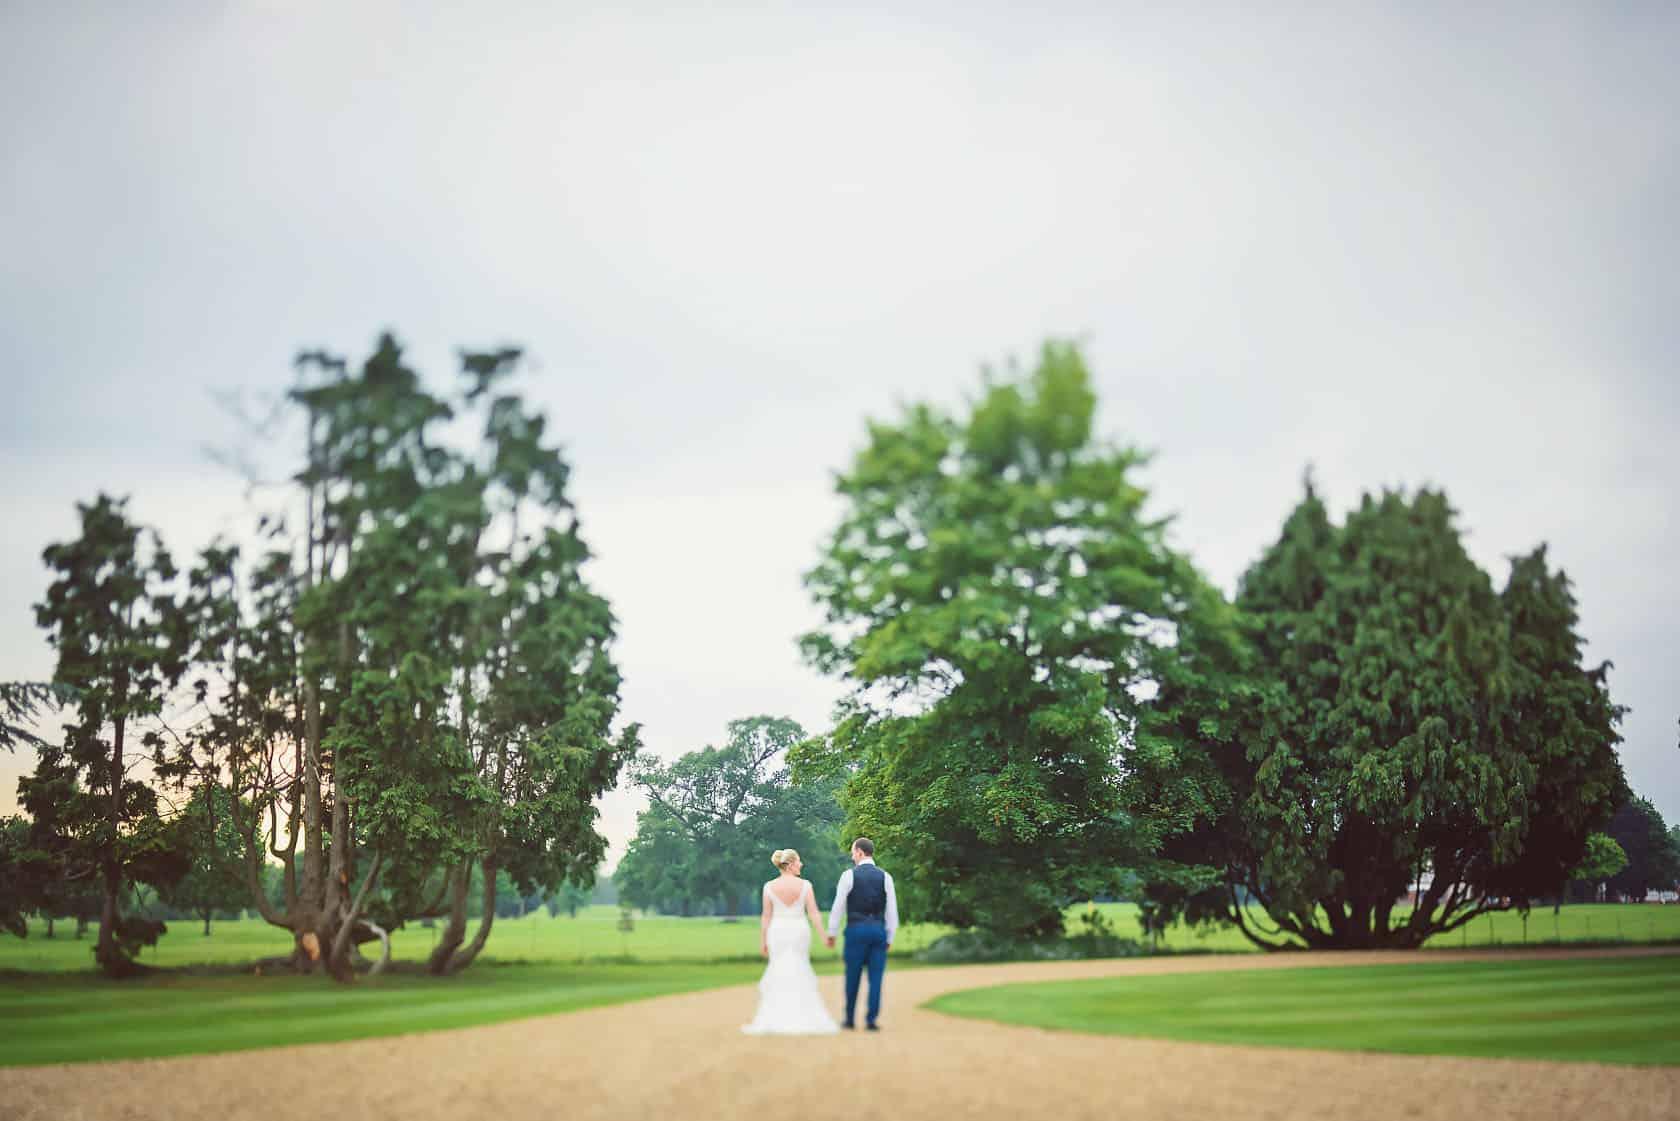 Gosfield_Hall_Wedding_Photography_KJ_Justin_Bailey_Photography tilt shift